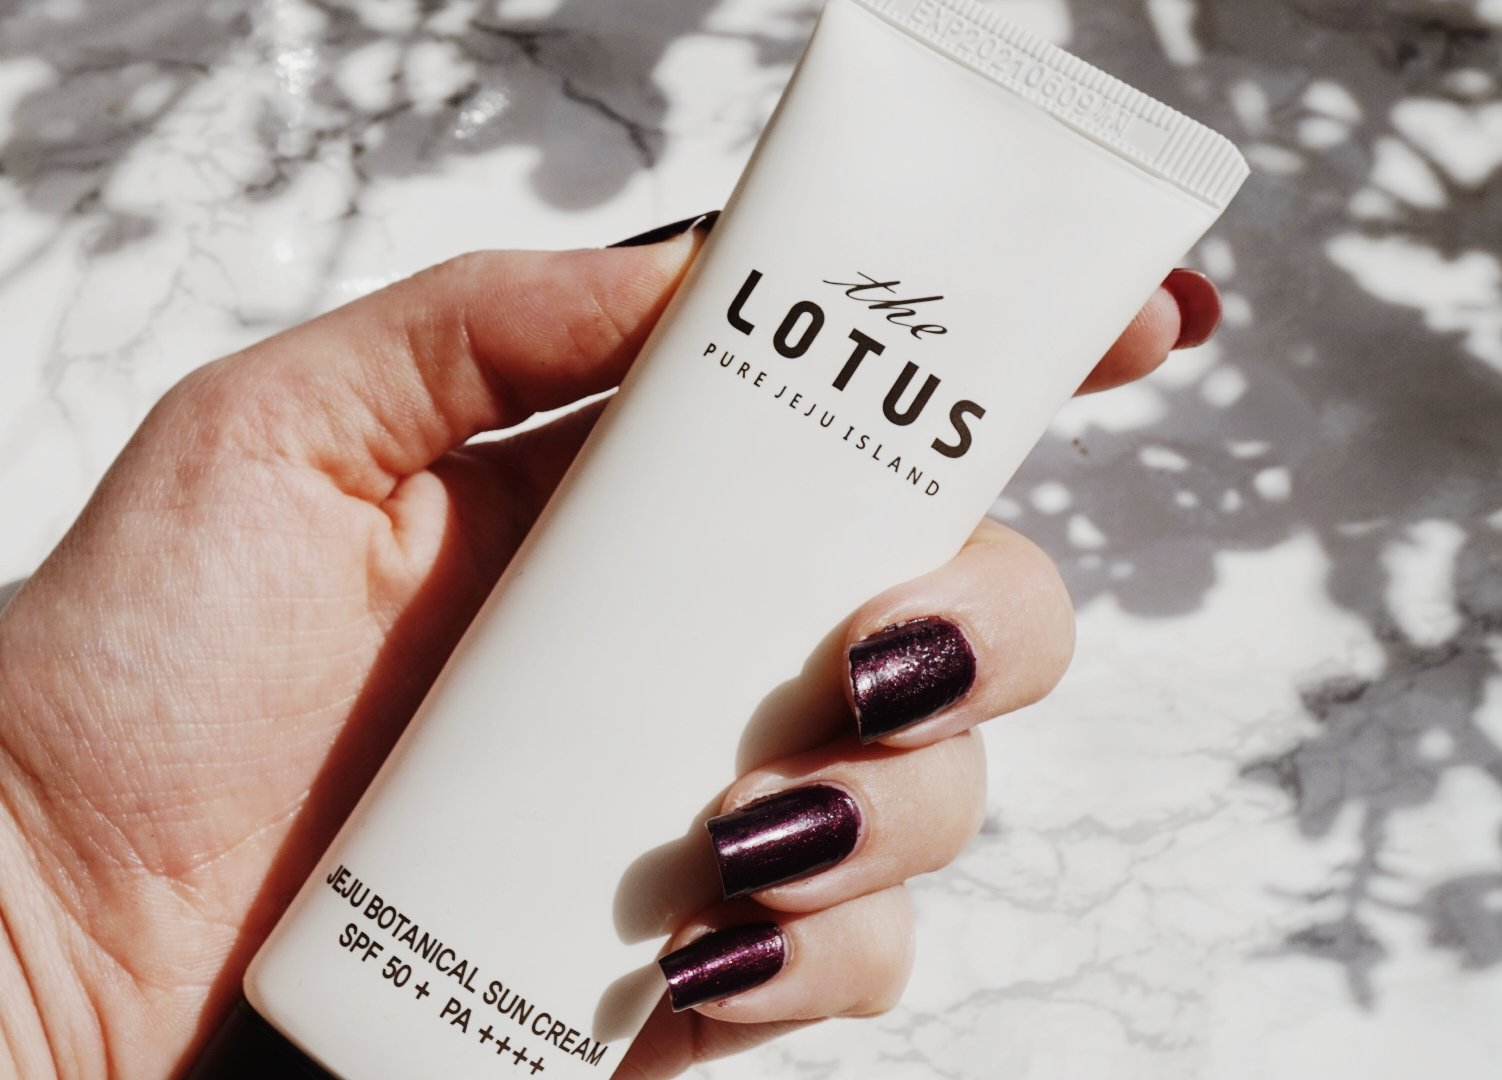 The Pure Lotus Jeju Botanical Sunscreen